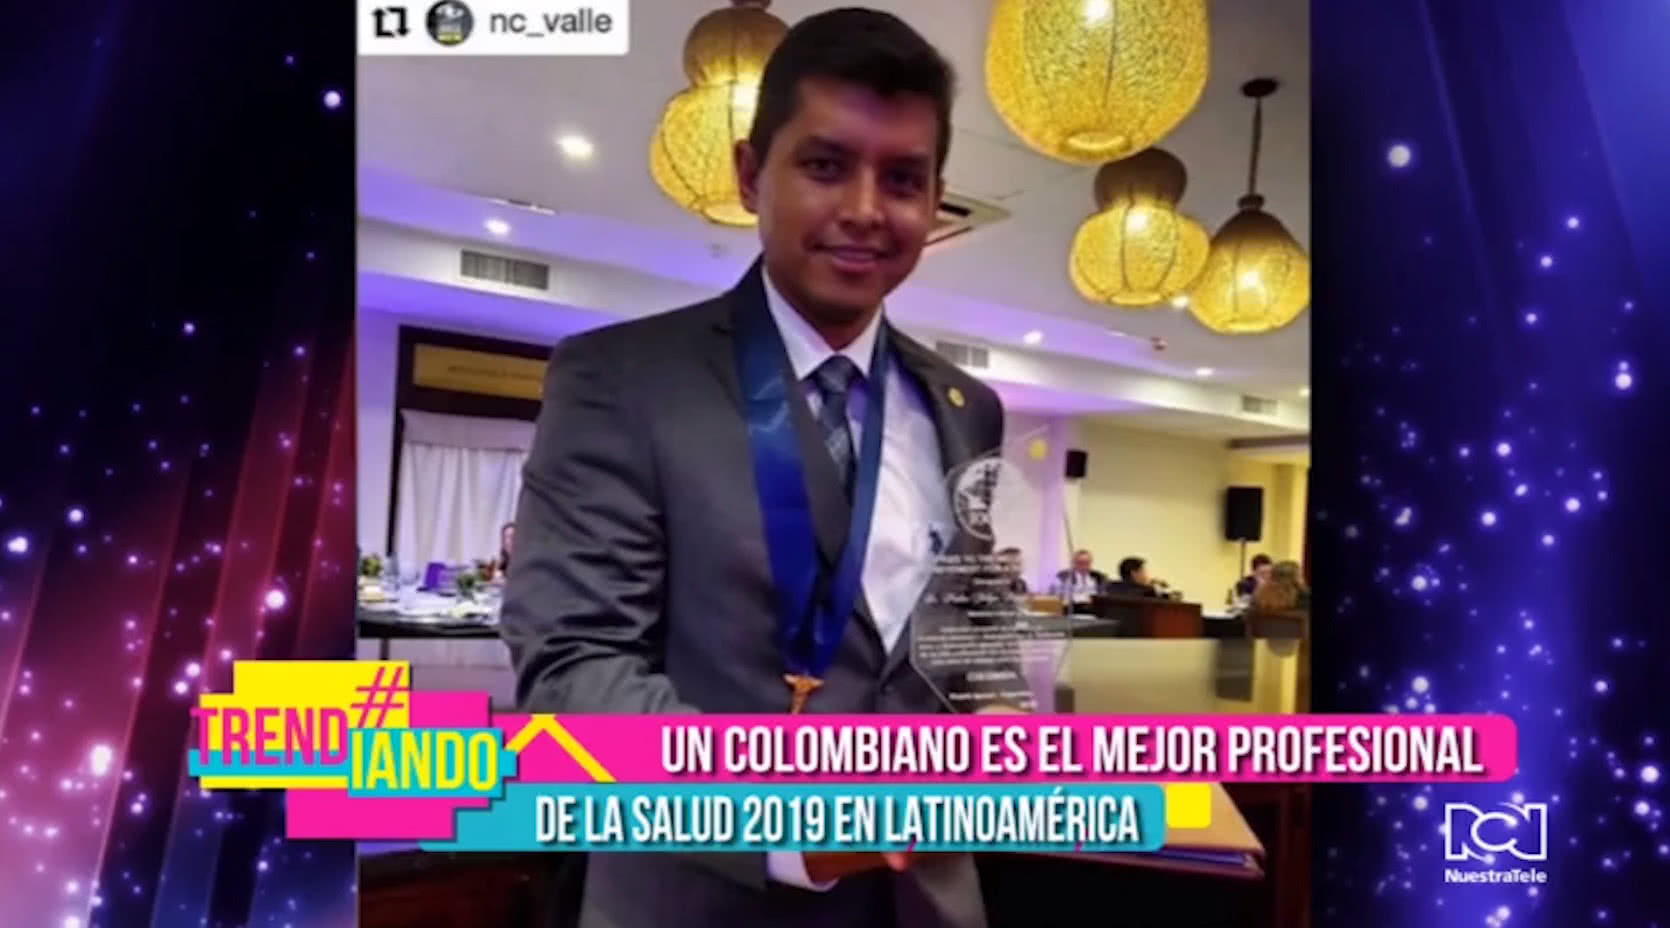 mejor-profesional-de-la-salud-de-latinoamerica-2019.jpg